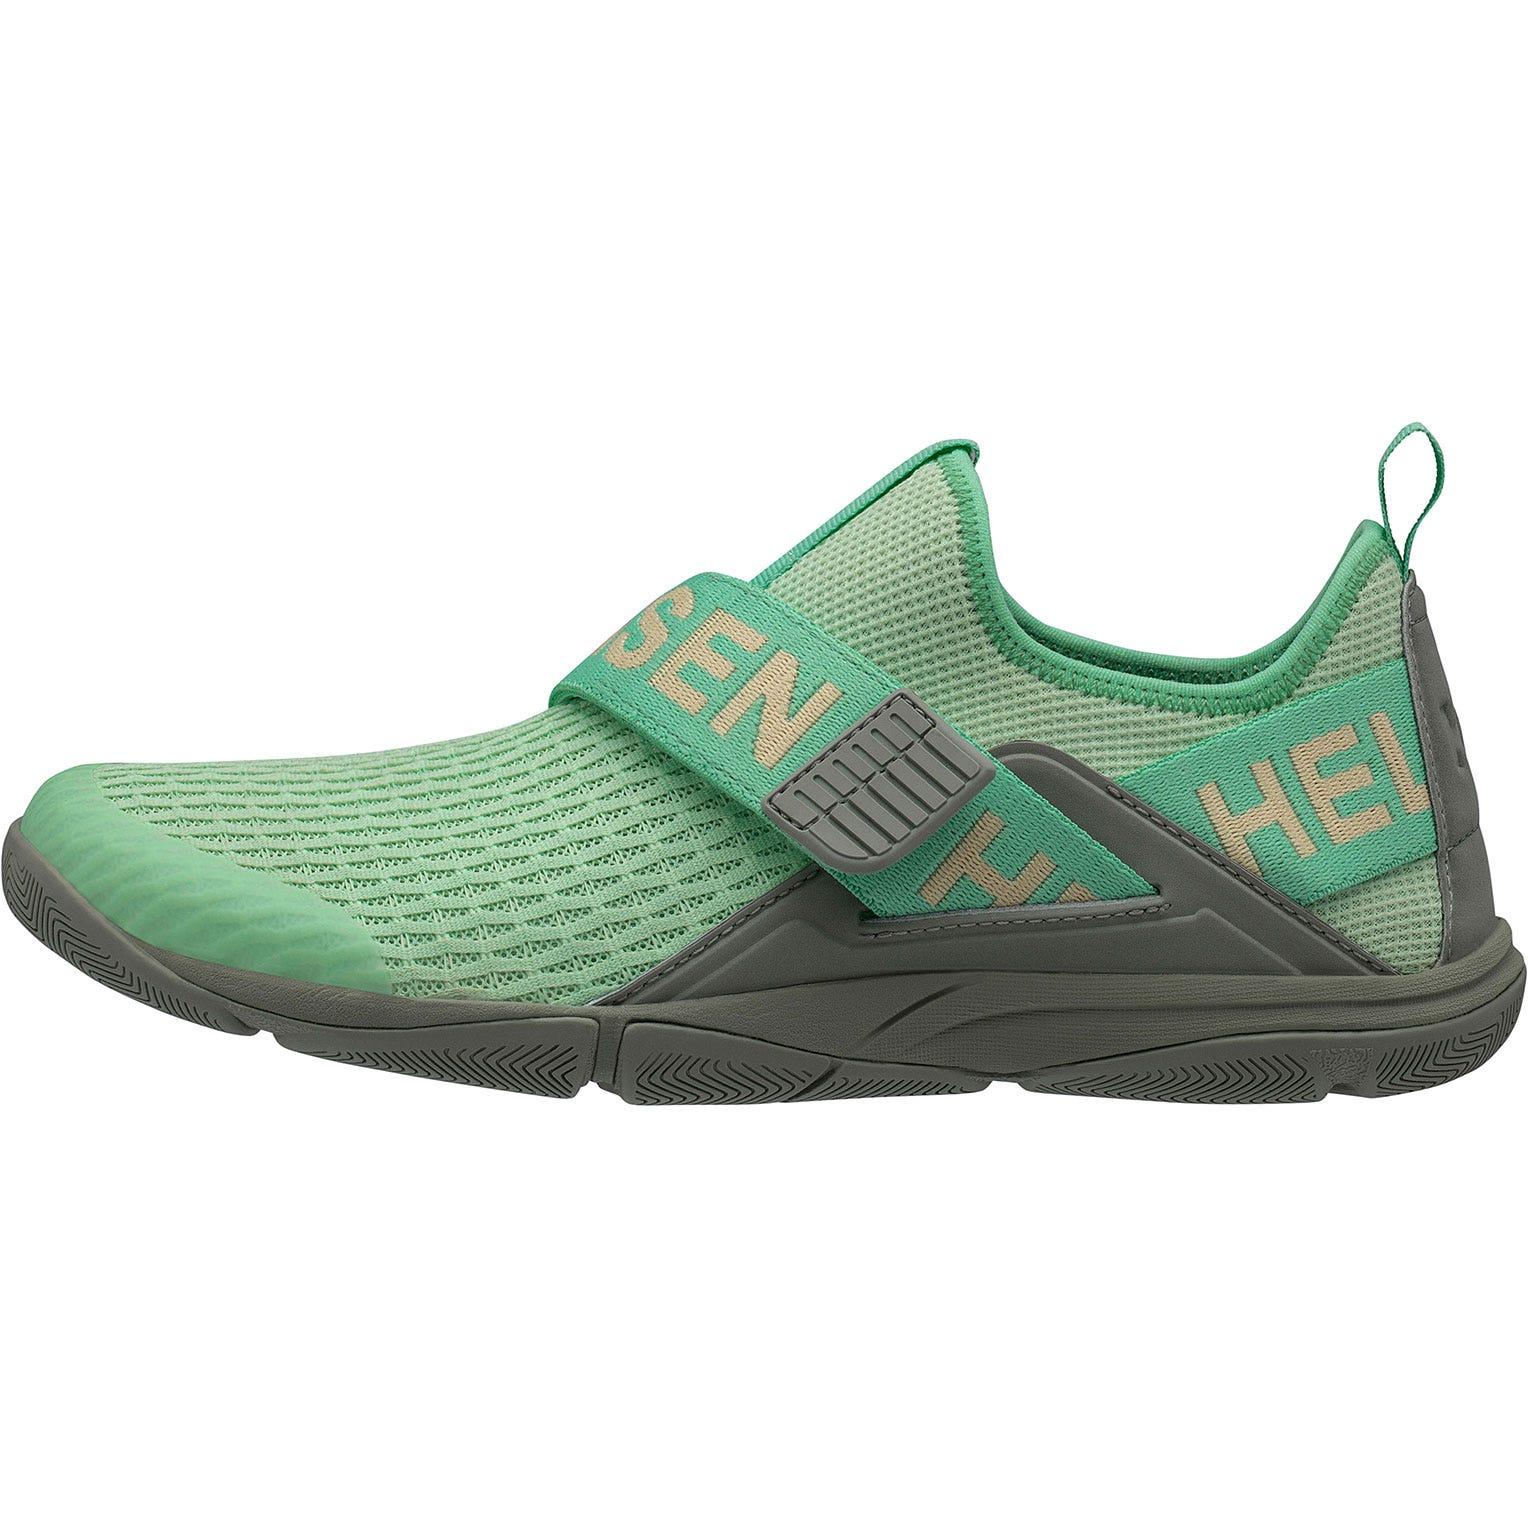 Helly Hansen W Hydromoc Slipon Shoe Womens Sailing Green 38.7/7.5